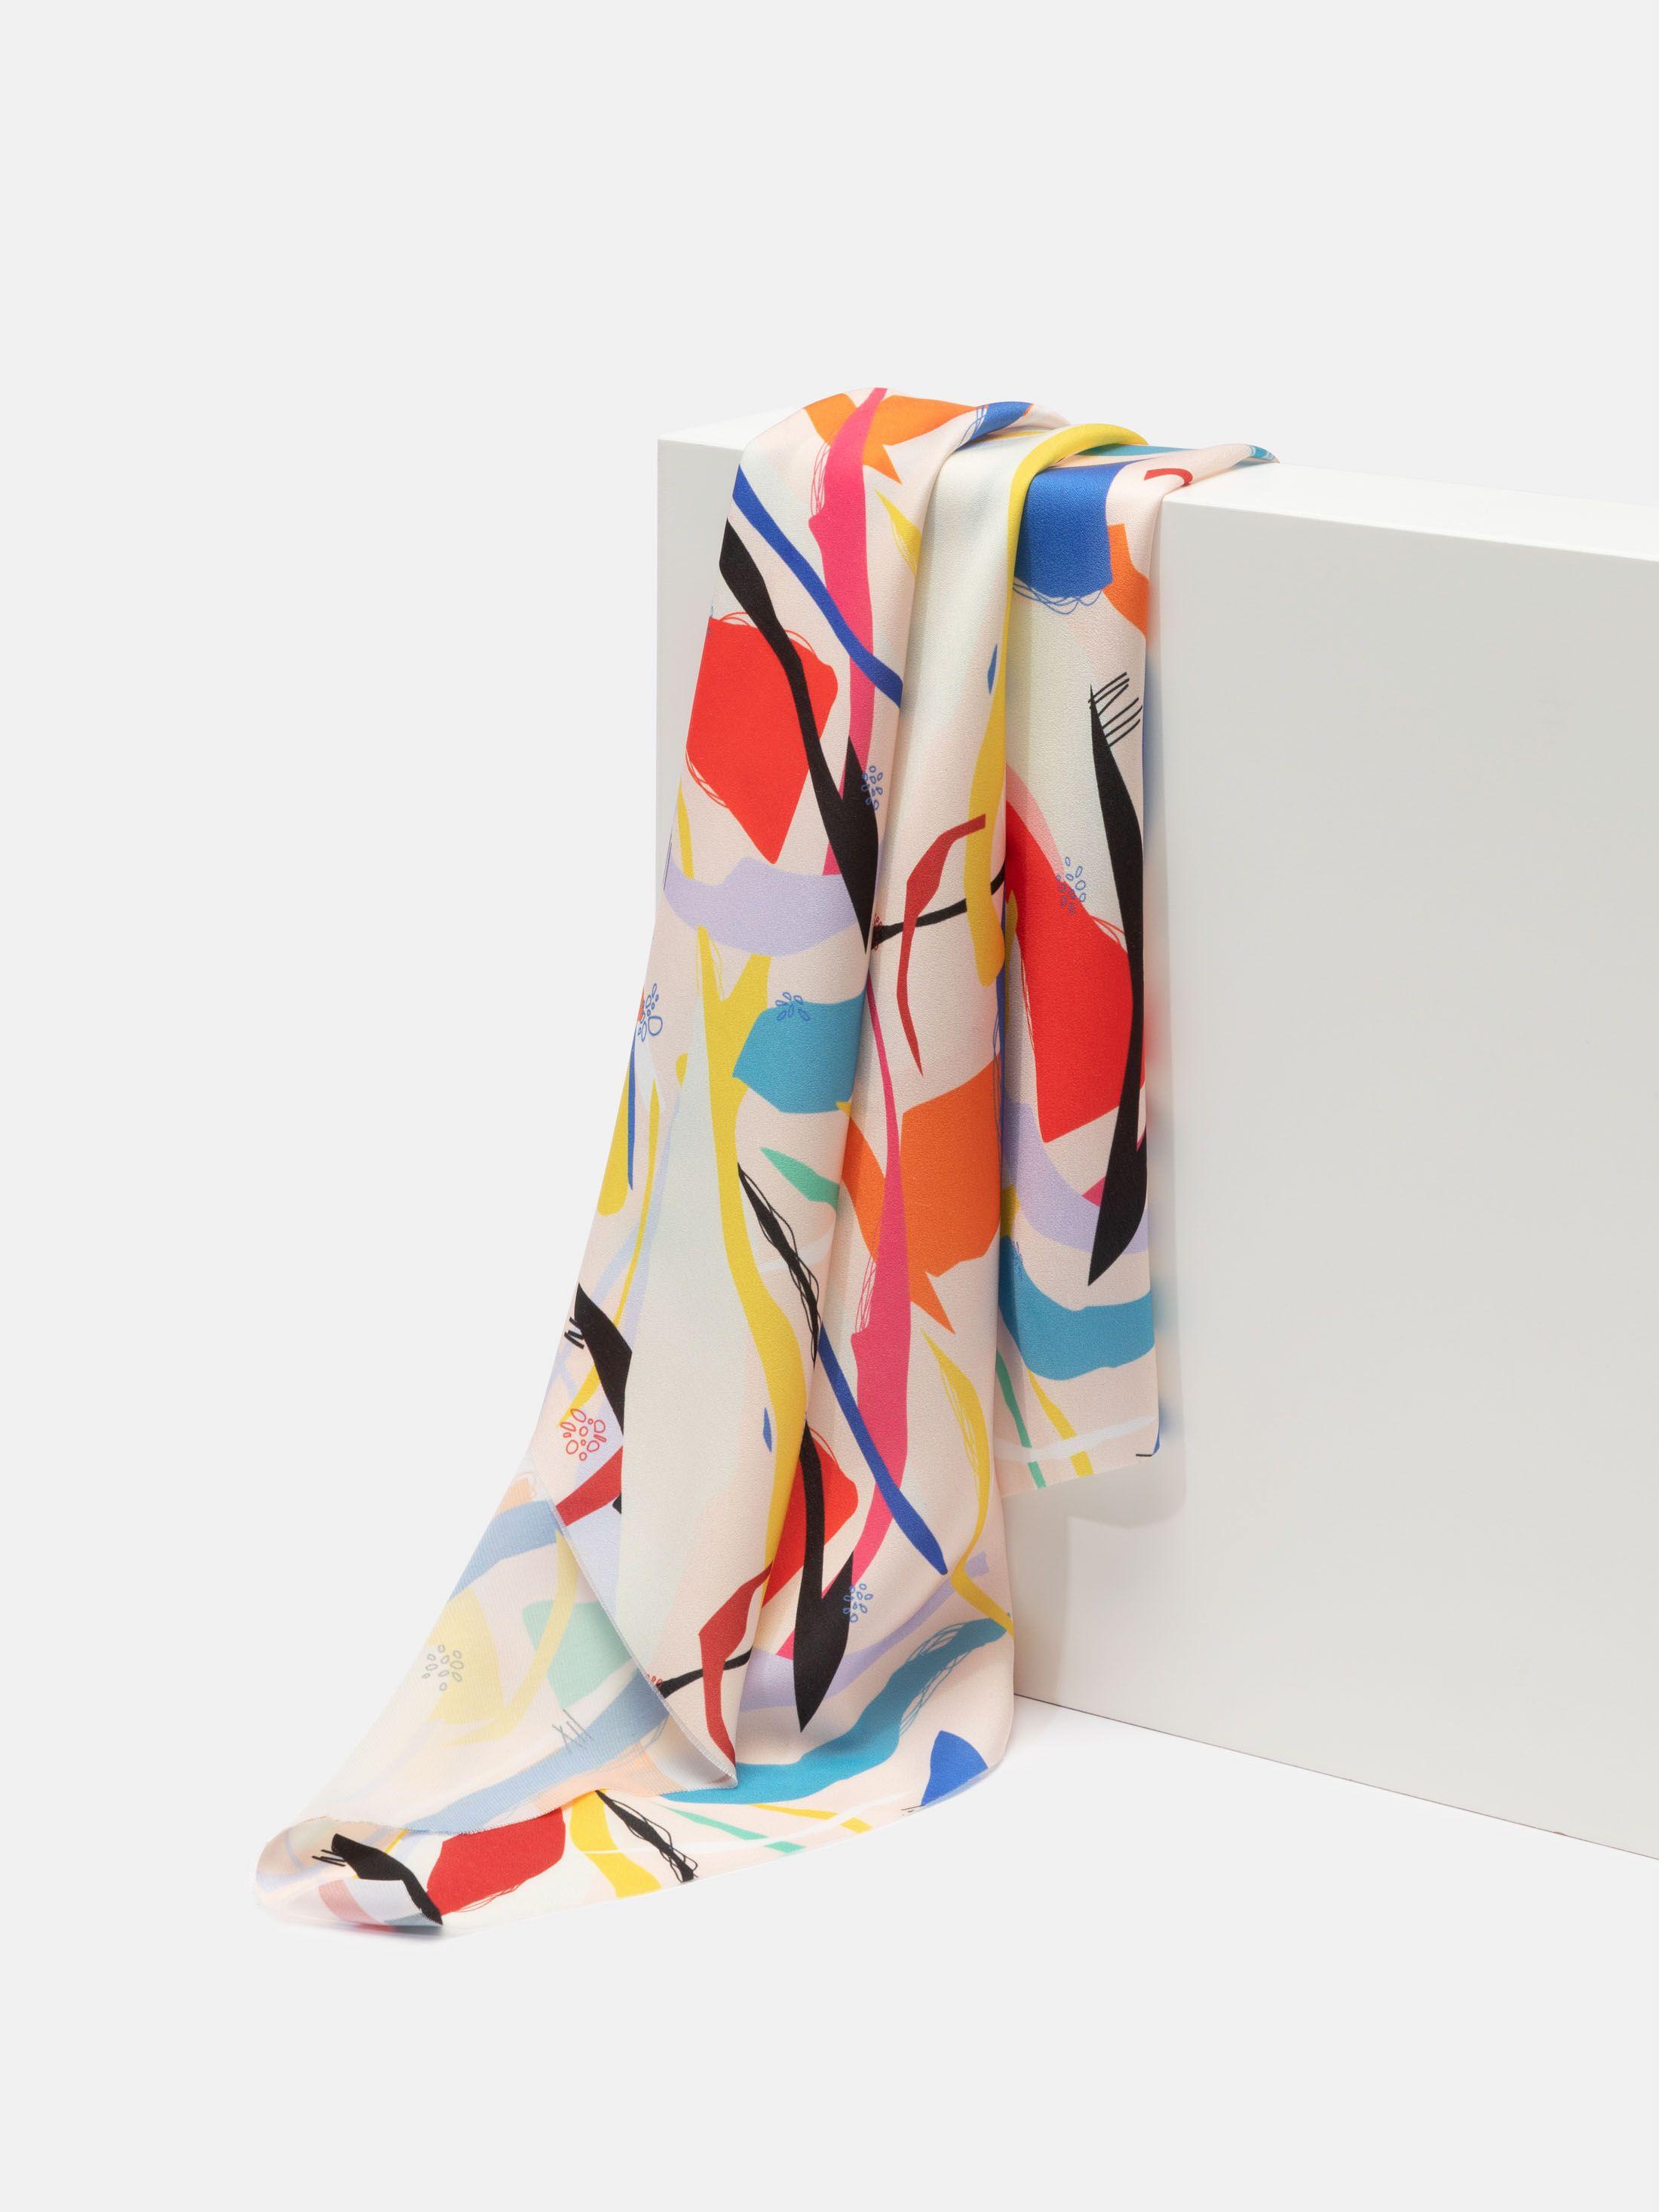 Impression sur le tissu crêpe en polyester